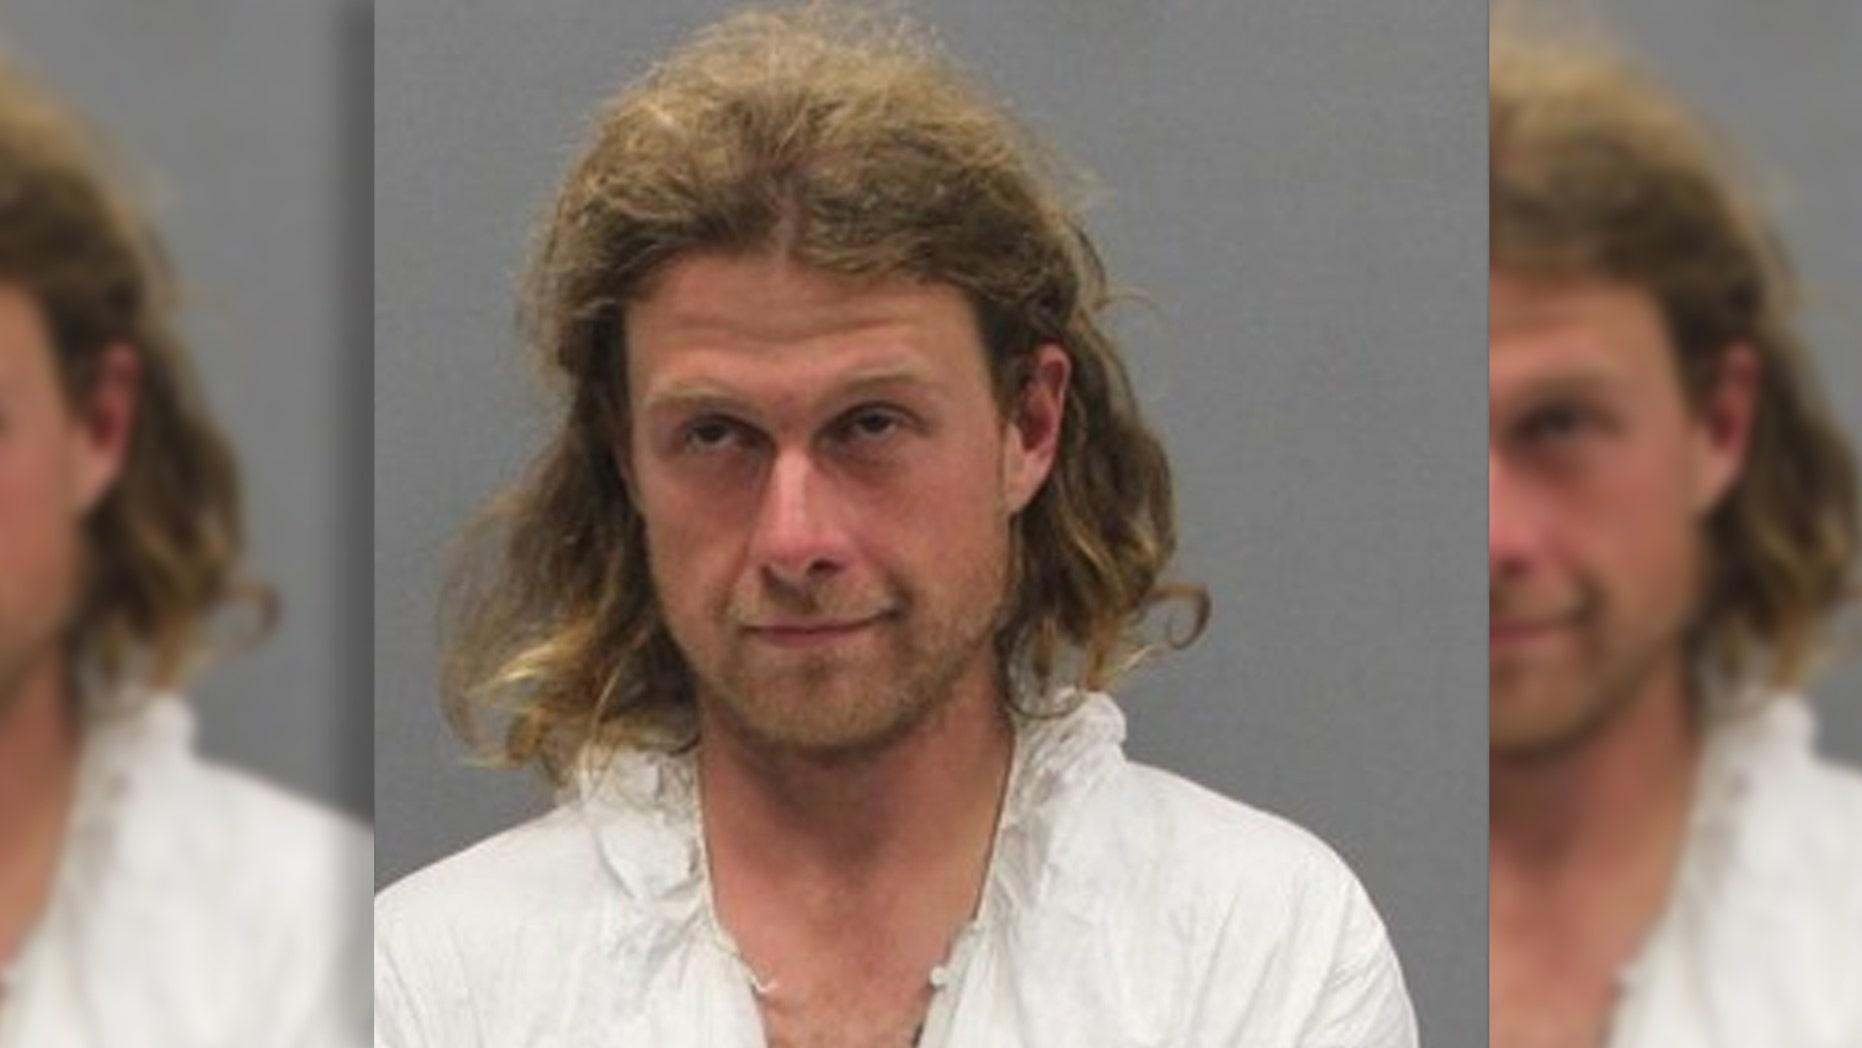 Westlake Legal Group James-L.-Jordan Feds arrest man in deadly machete attack on Appalachian Trail in Virginia Robert Gearty fox-news/us/us-regions/southeast/virginia fox-news/us/crime/homicide fox news fnc/us fnc article a94f8688-86c0-5bb9-aaf0-015d65c9d896